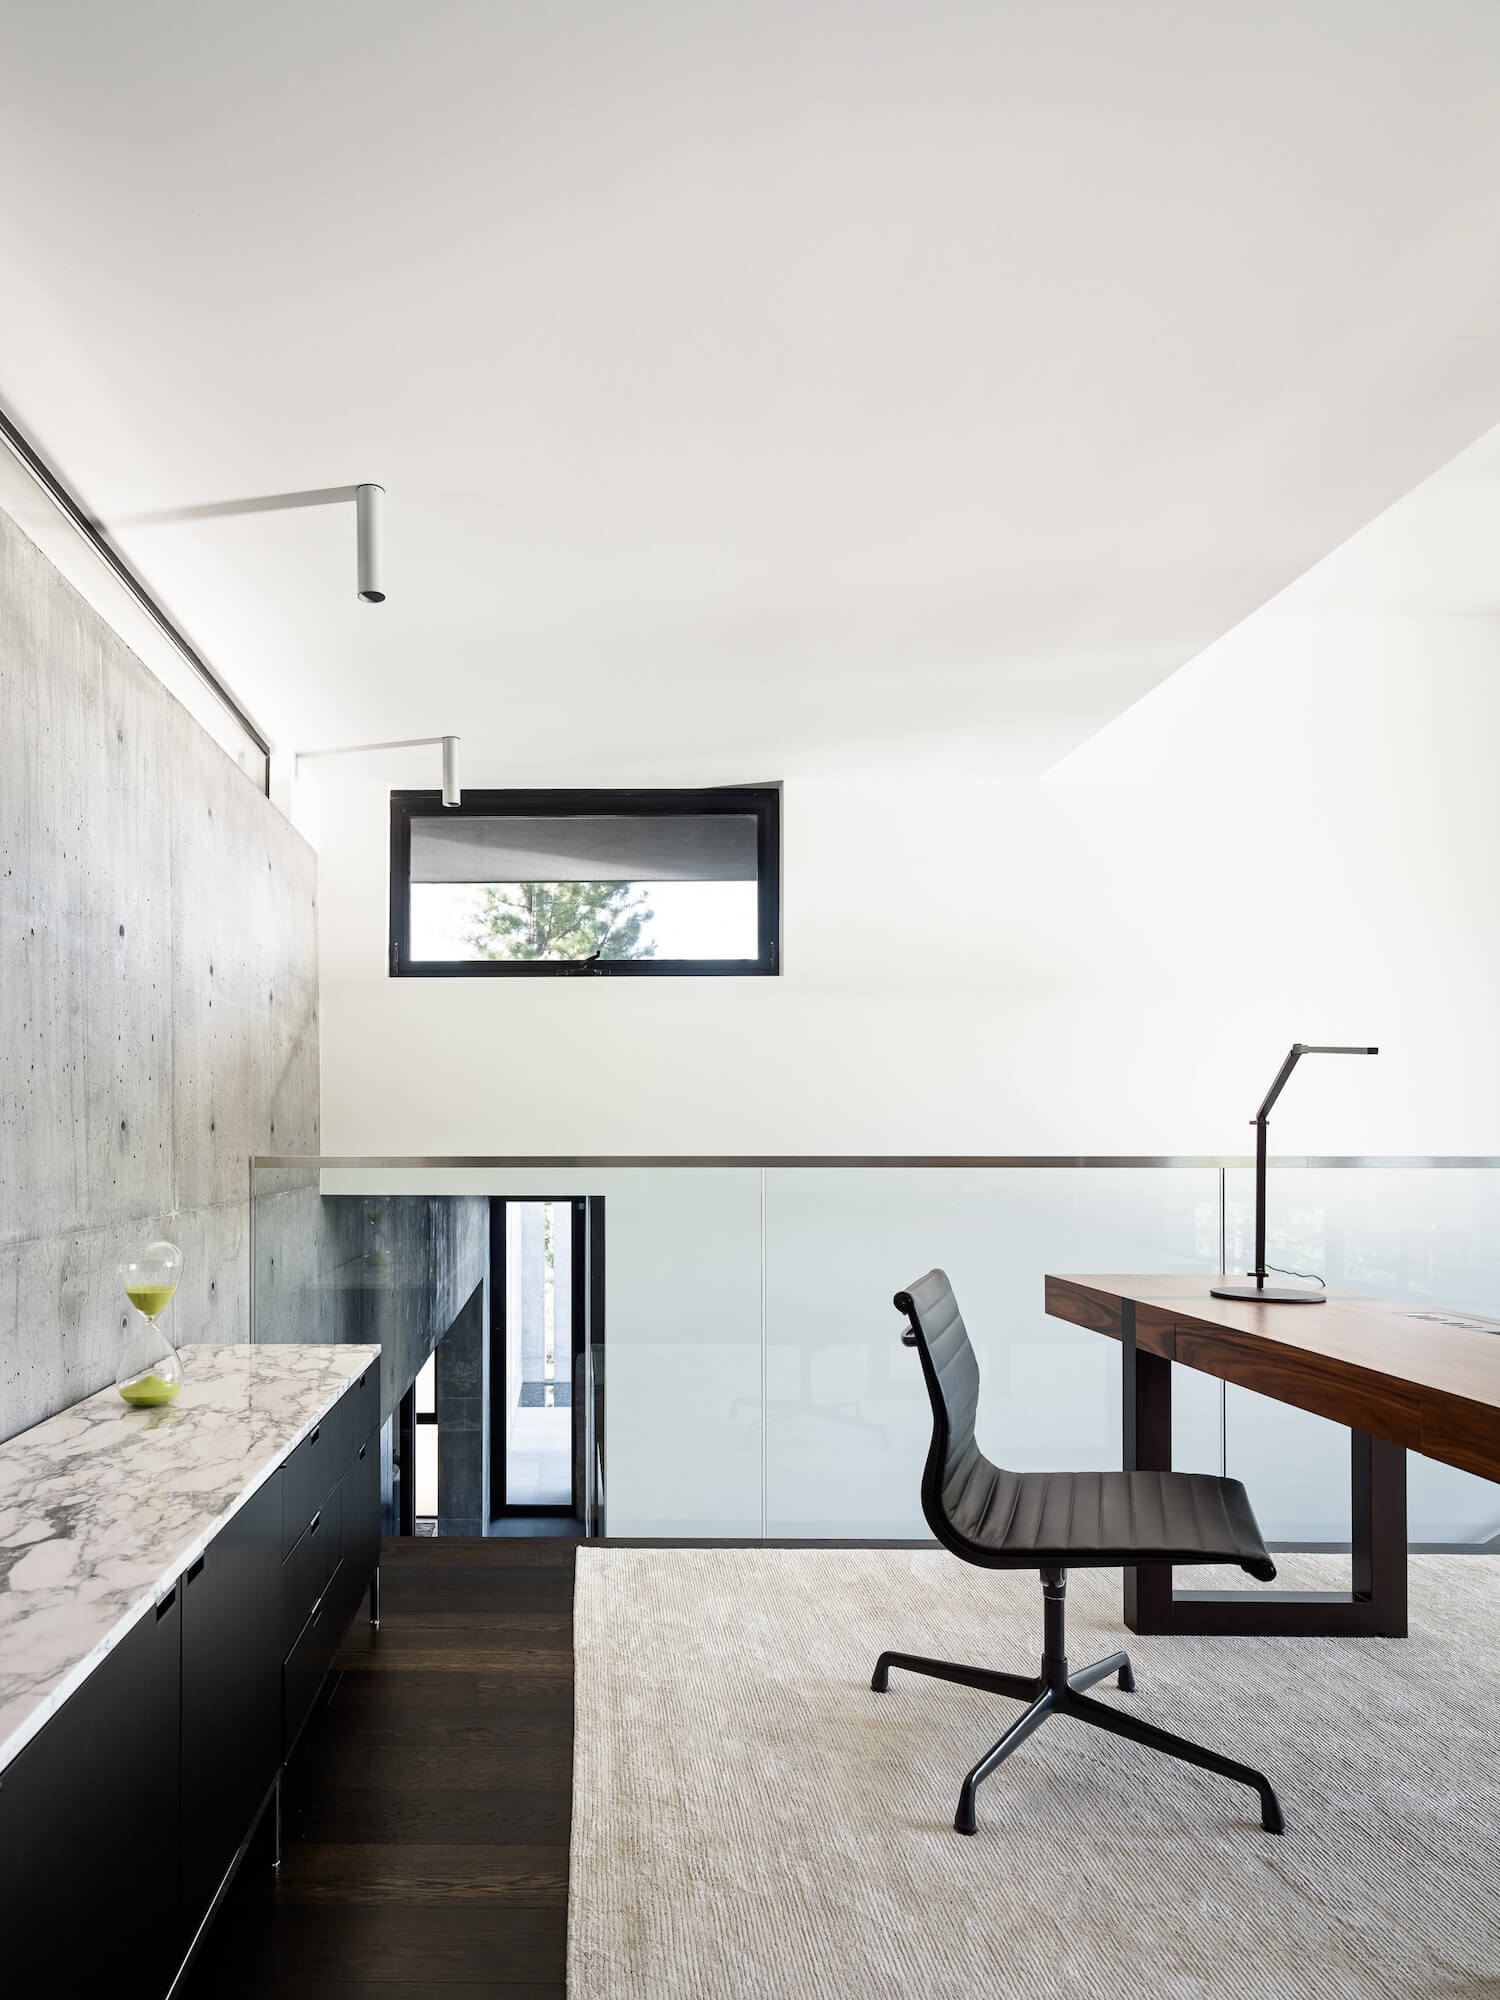 est living creek house faulkner architects 1